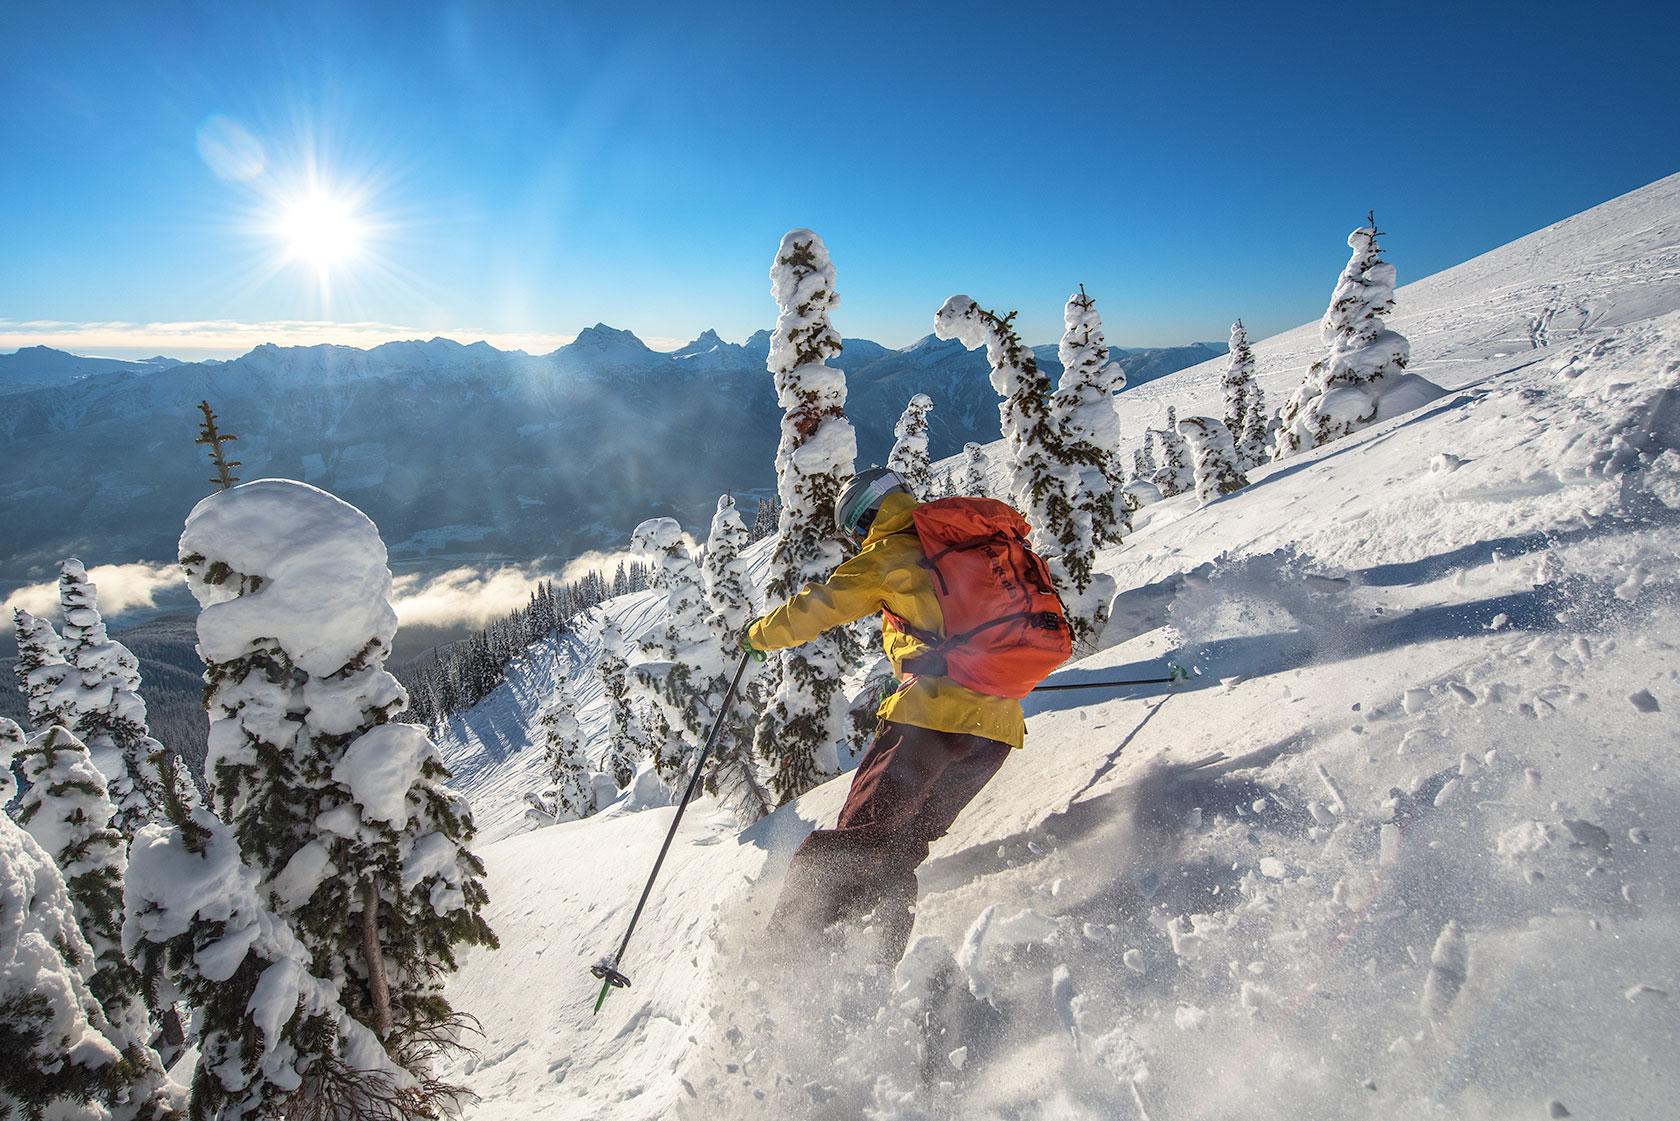 austin-trigg-patagonia-banff-alberta-winter-revelstoke-bc-british-columbia-mountains-valley-snow-skiing-touring-backcountry-adventure-powder-turn.jpg